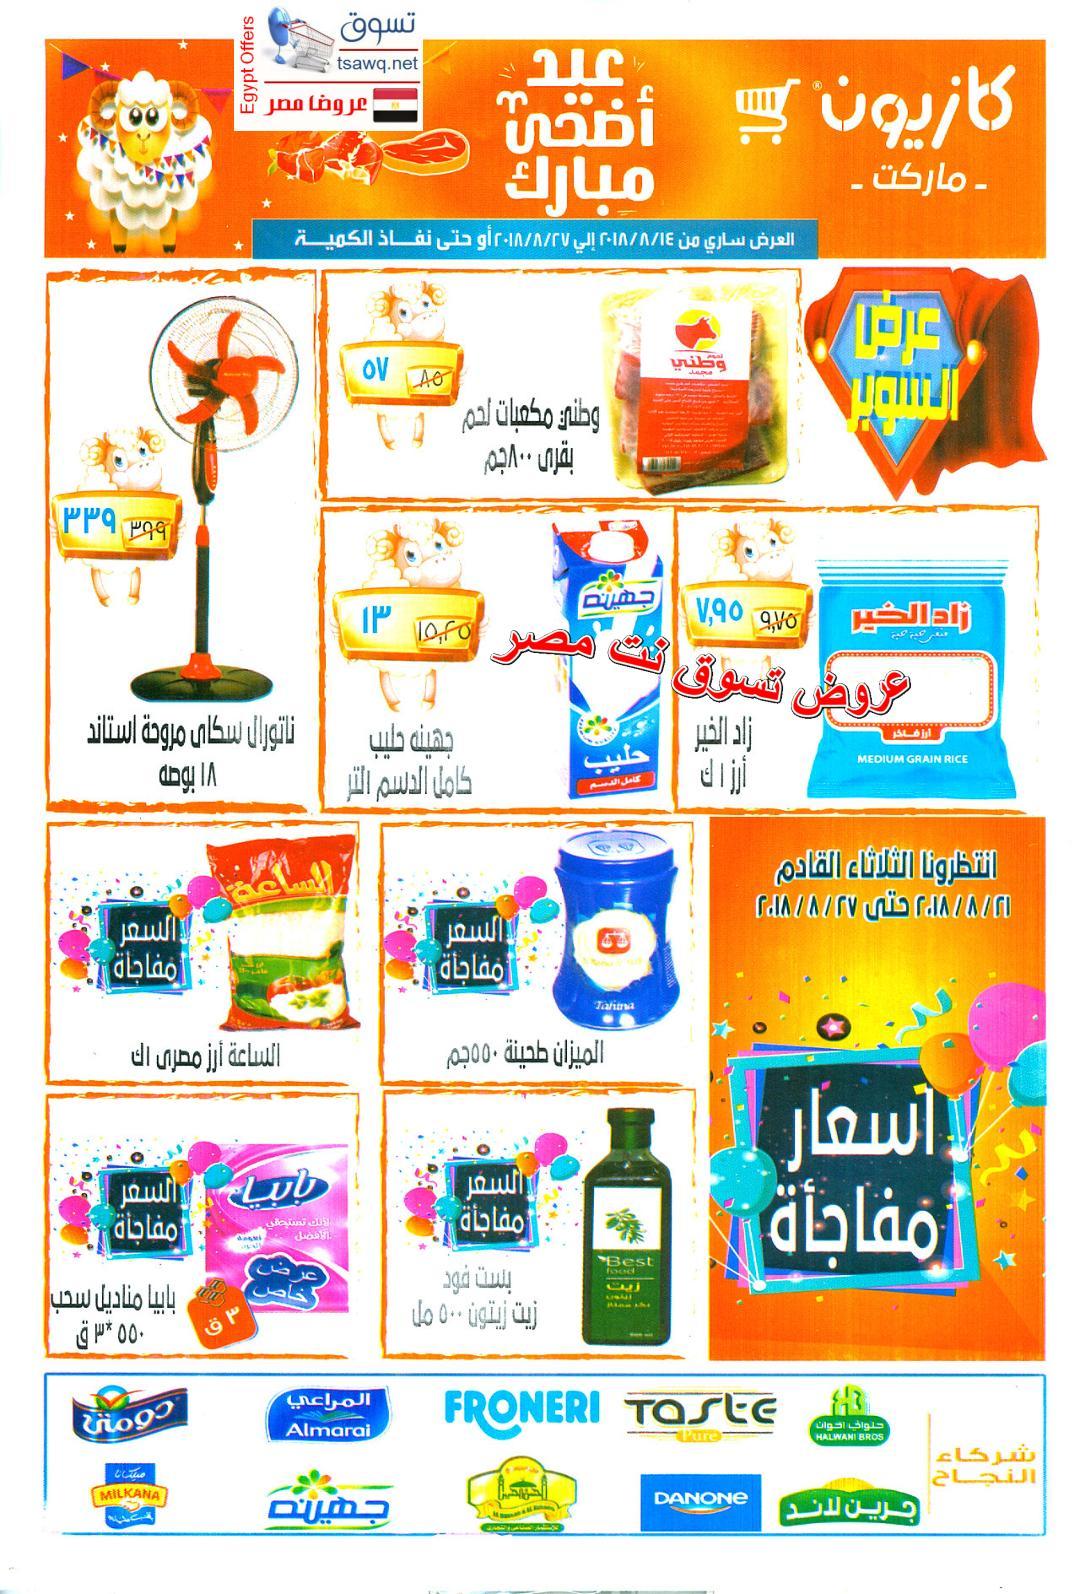 e7b4b3b06 عروض كازيون ماركت مصر عيد الاضحى من 14 حتى 27 أغسطس 2018 | تسوق نت